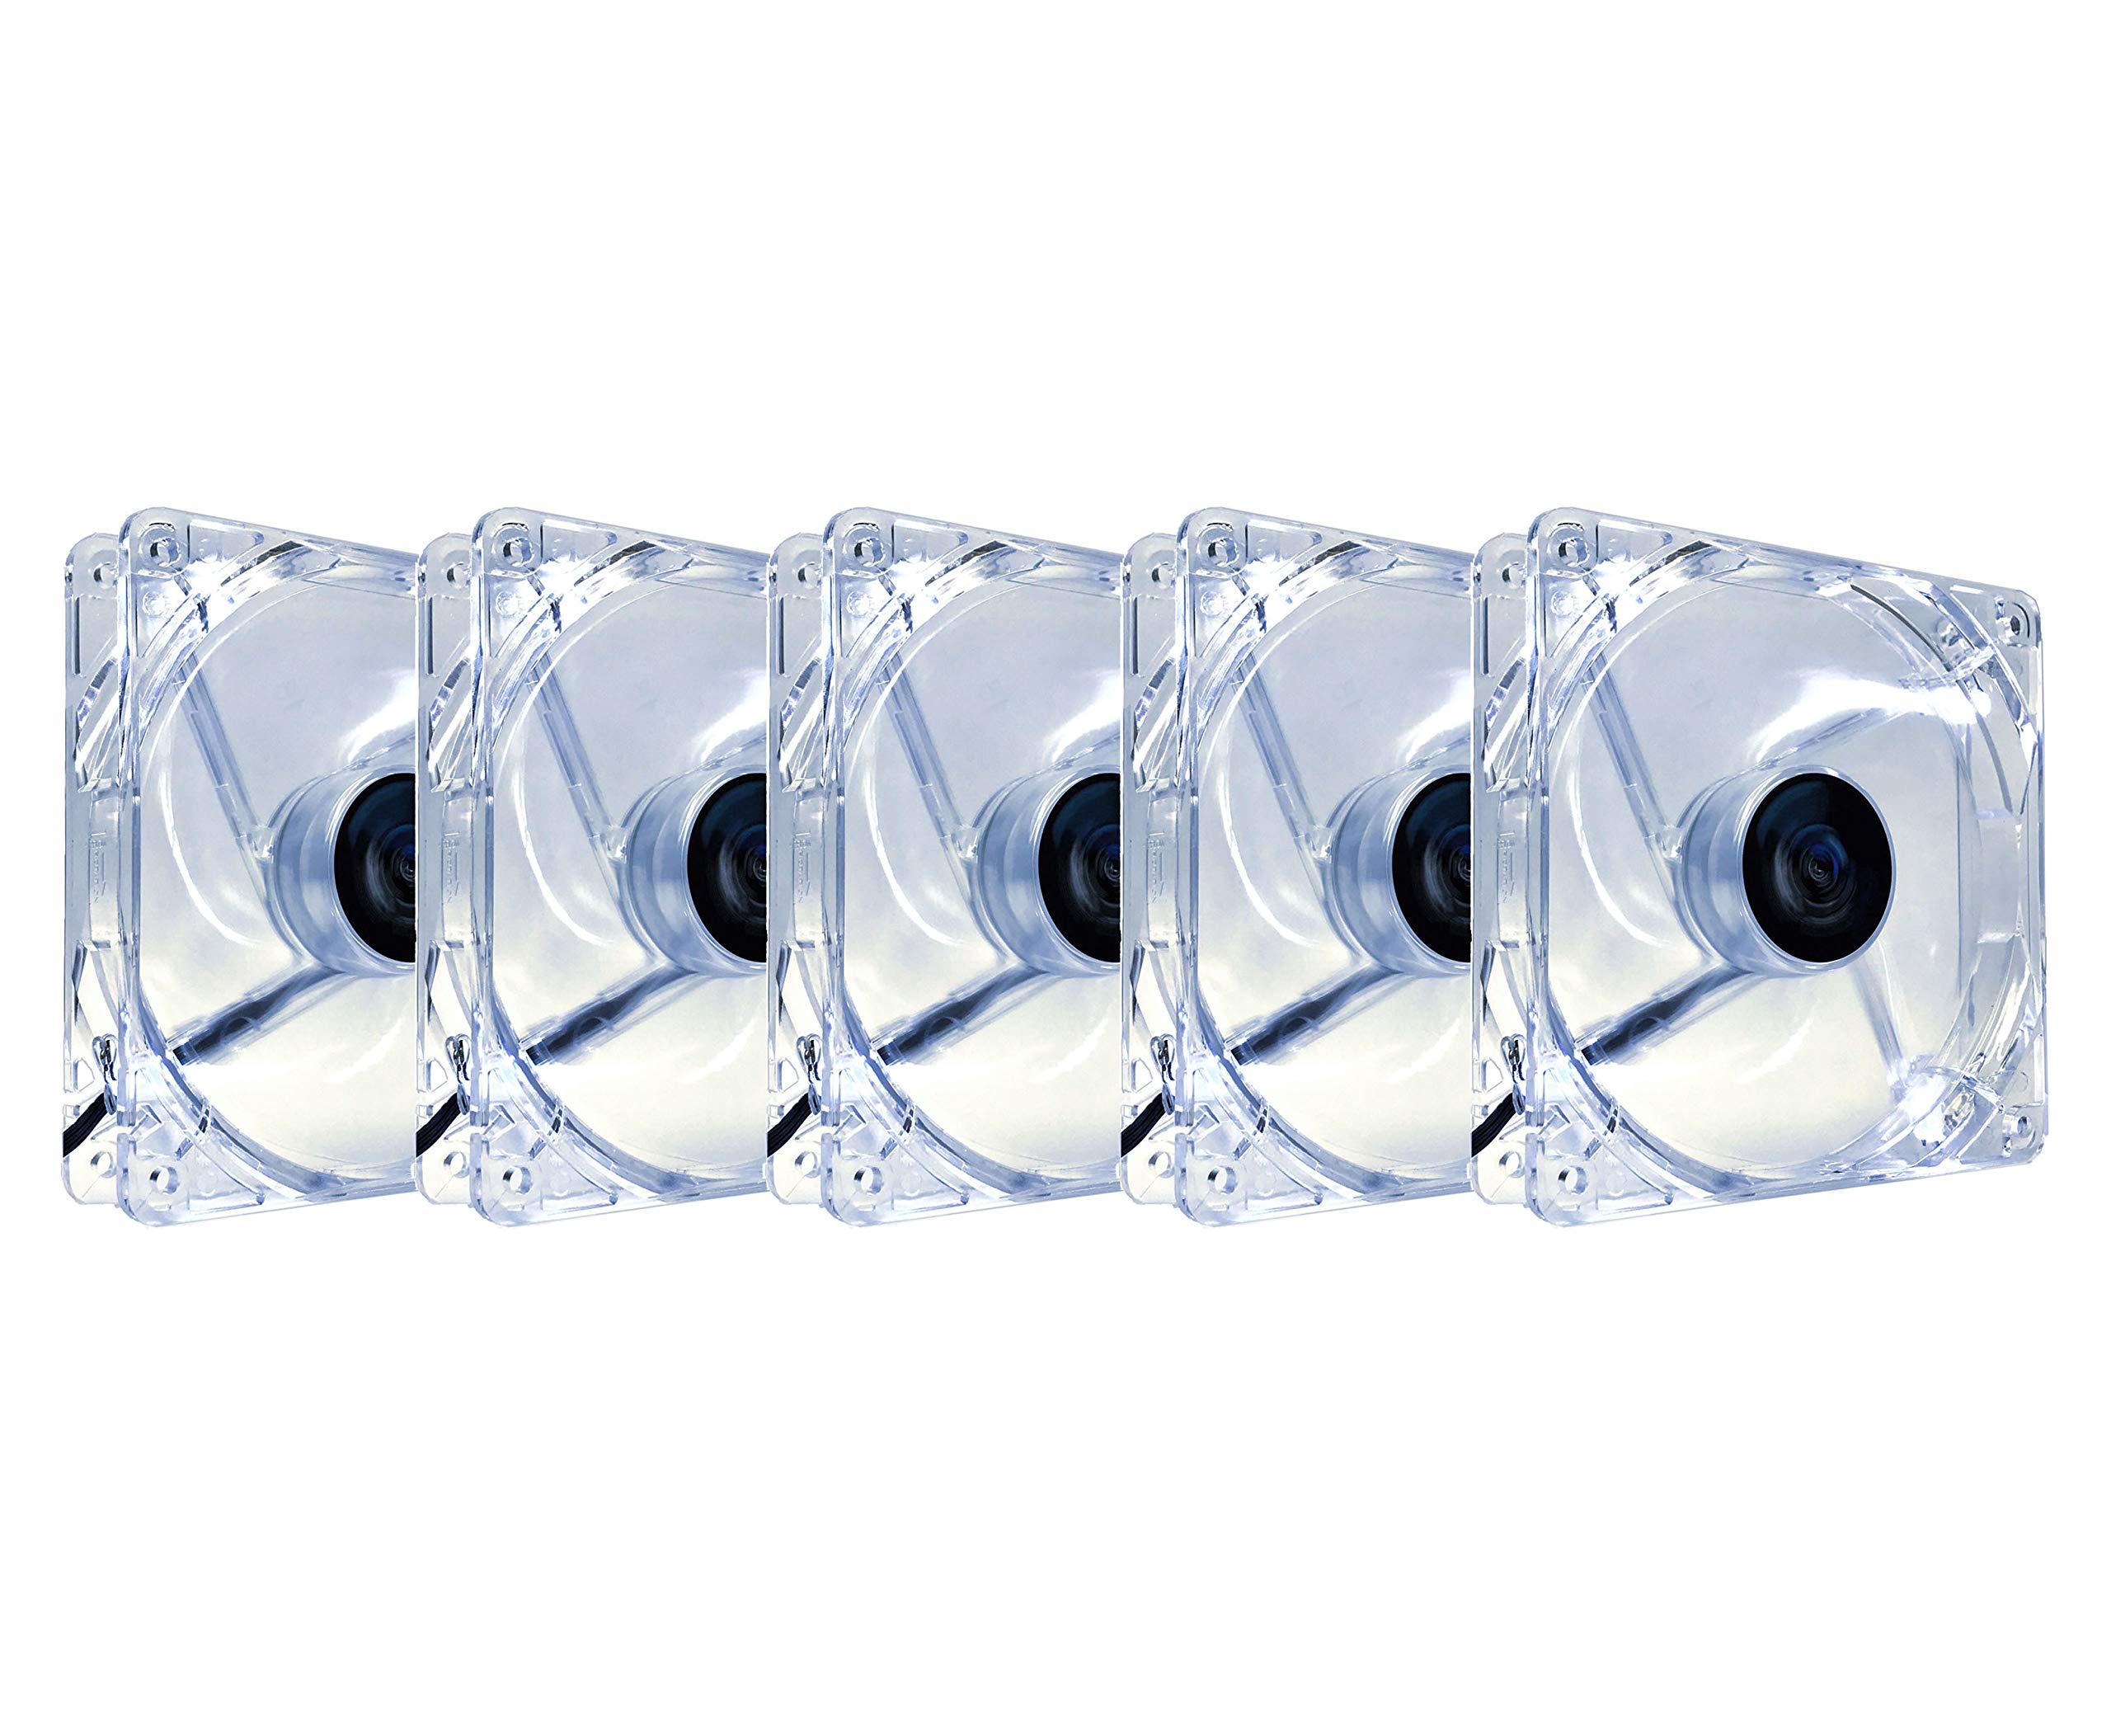 APEVIA AF512L-WHT 120mm 4pin+3pin Silent White LED Case Fan (5-pk)